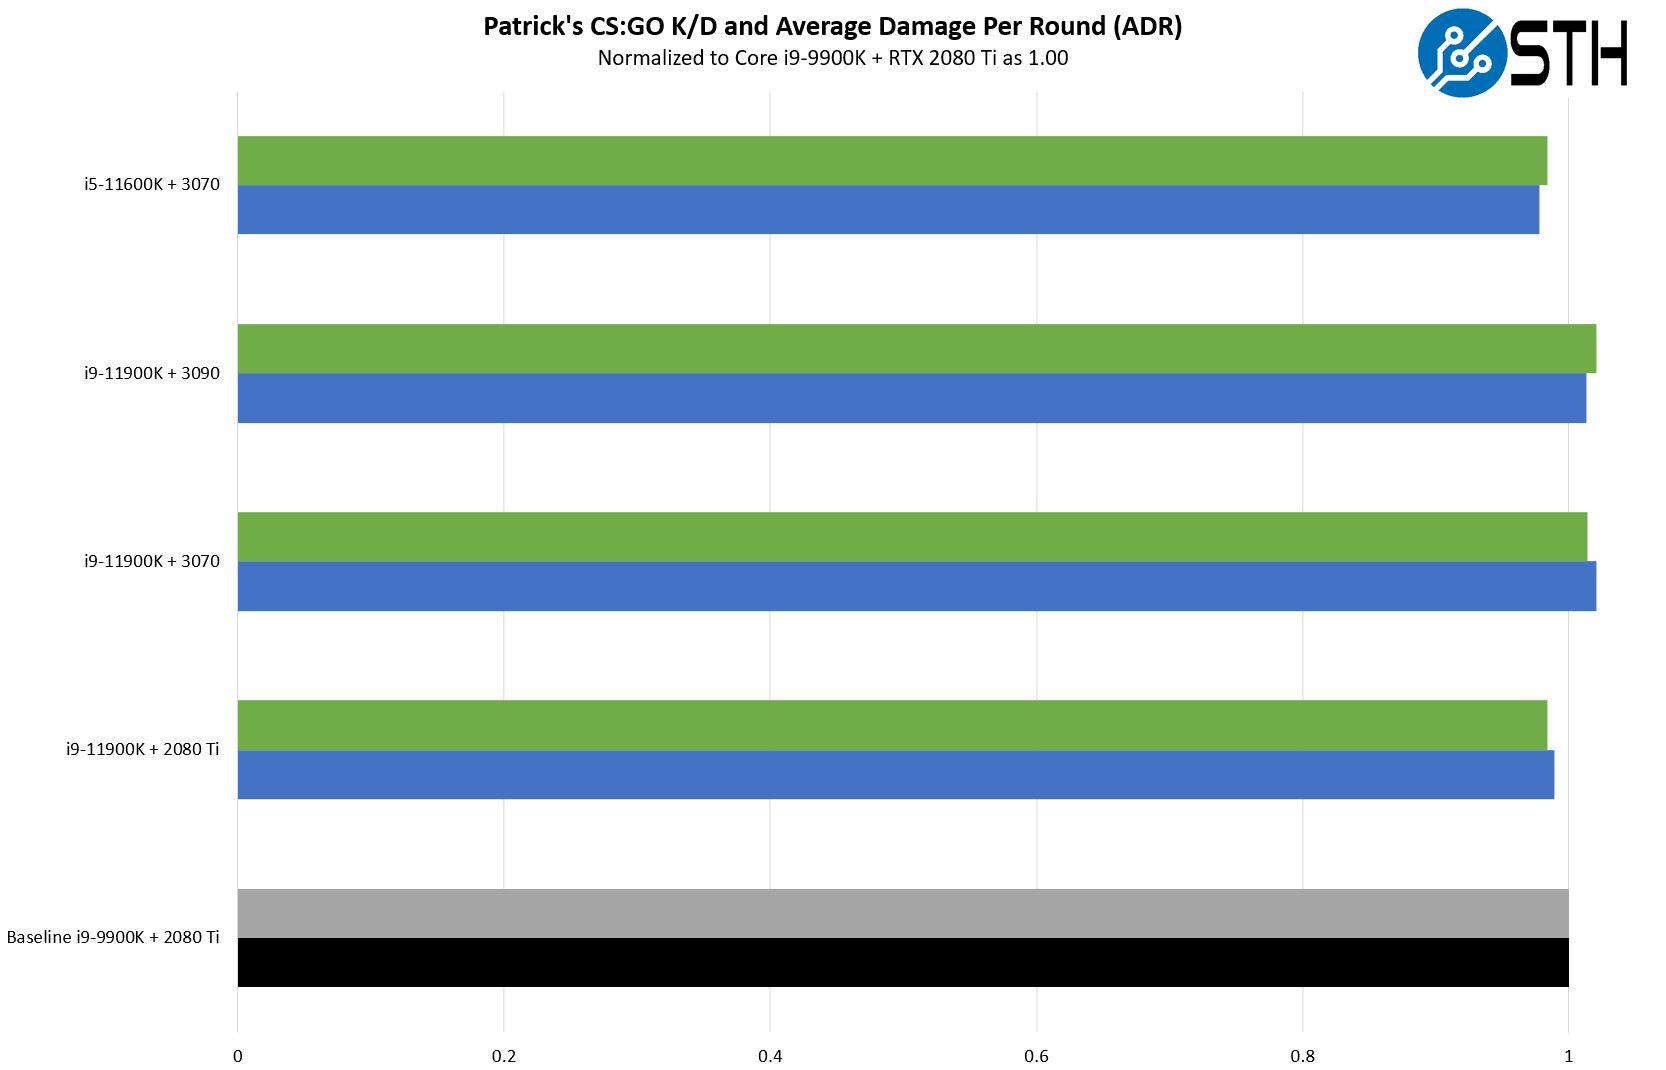 Intel Core I9 11900K Patrick Normalized CSGO KD And ADR